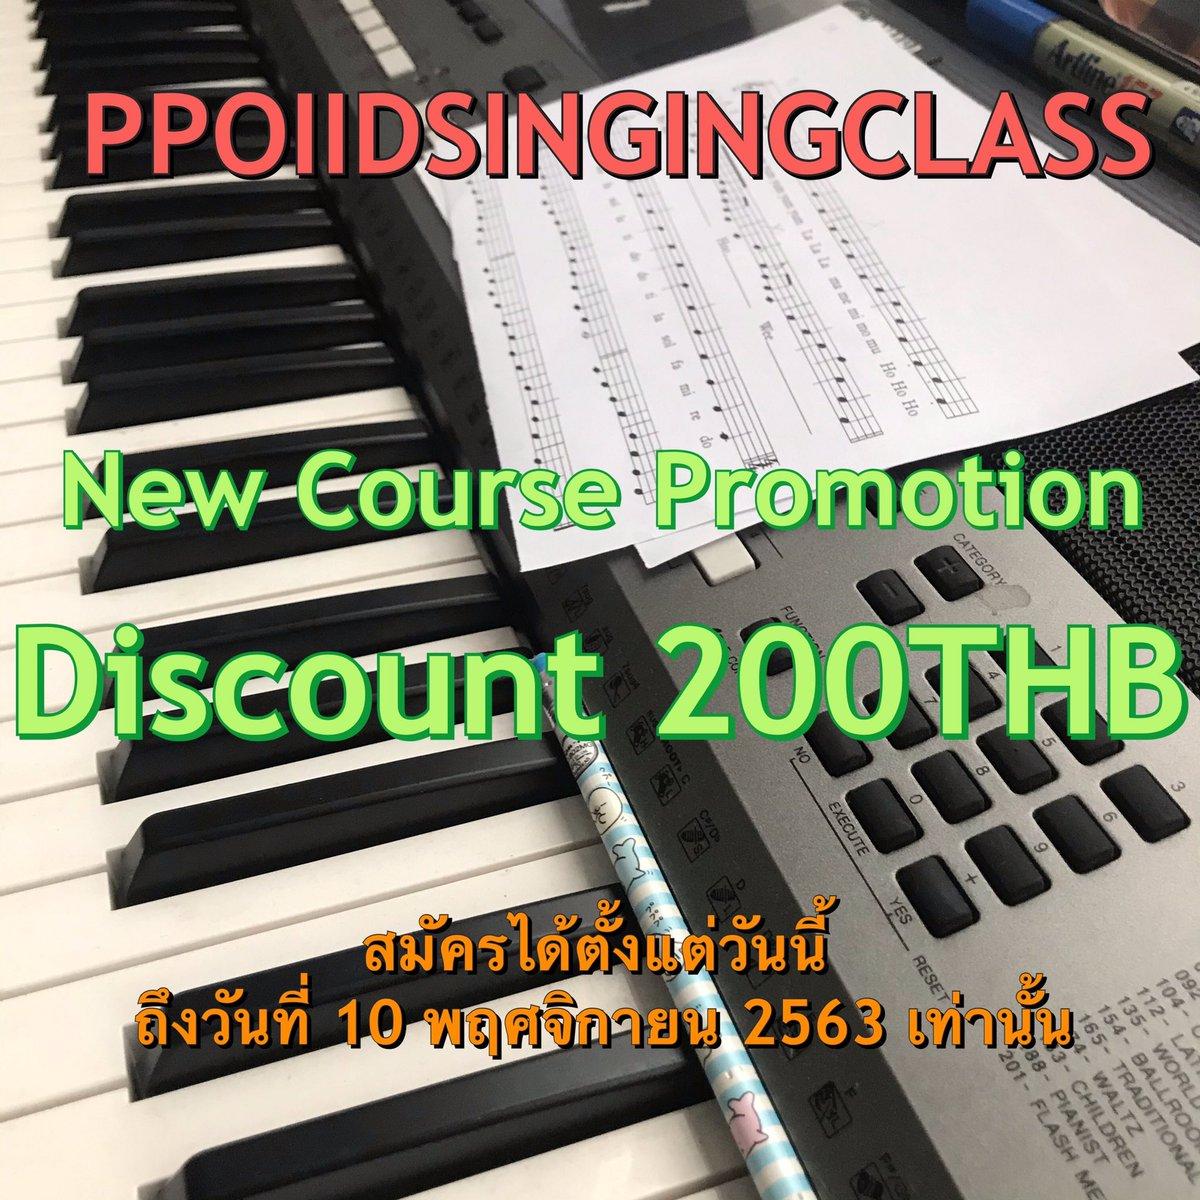 #PPOIIDSINGINGCLASS New Course Promotion  #DISCOUNT200thb สมัครได้แล้วตั้งแต่วันนี้-10 พ.ย. 63 รายละเอียดการสมัครจะลงในเธรดข้างล่างนะคะ #เรียนร้องเพลง #สอนร้องเพลง #เรียนขับร้อง #สอนขับร้อง #voiceclass #singingclass #vocalclass #ร้องเพลง #ขับร้อง #เปิดสอนร้องเพลง https://t.co/udA7WUtdfC